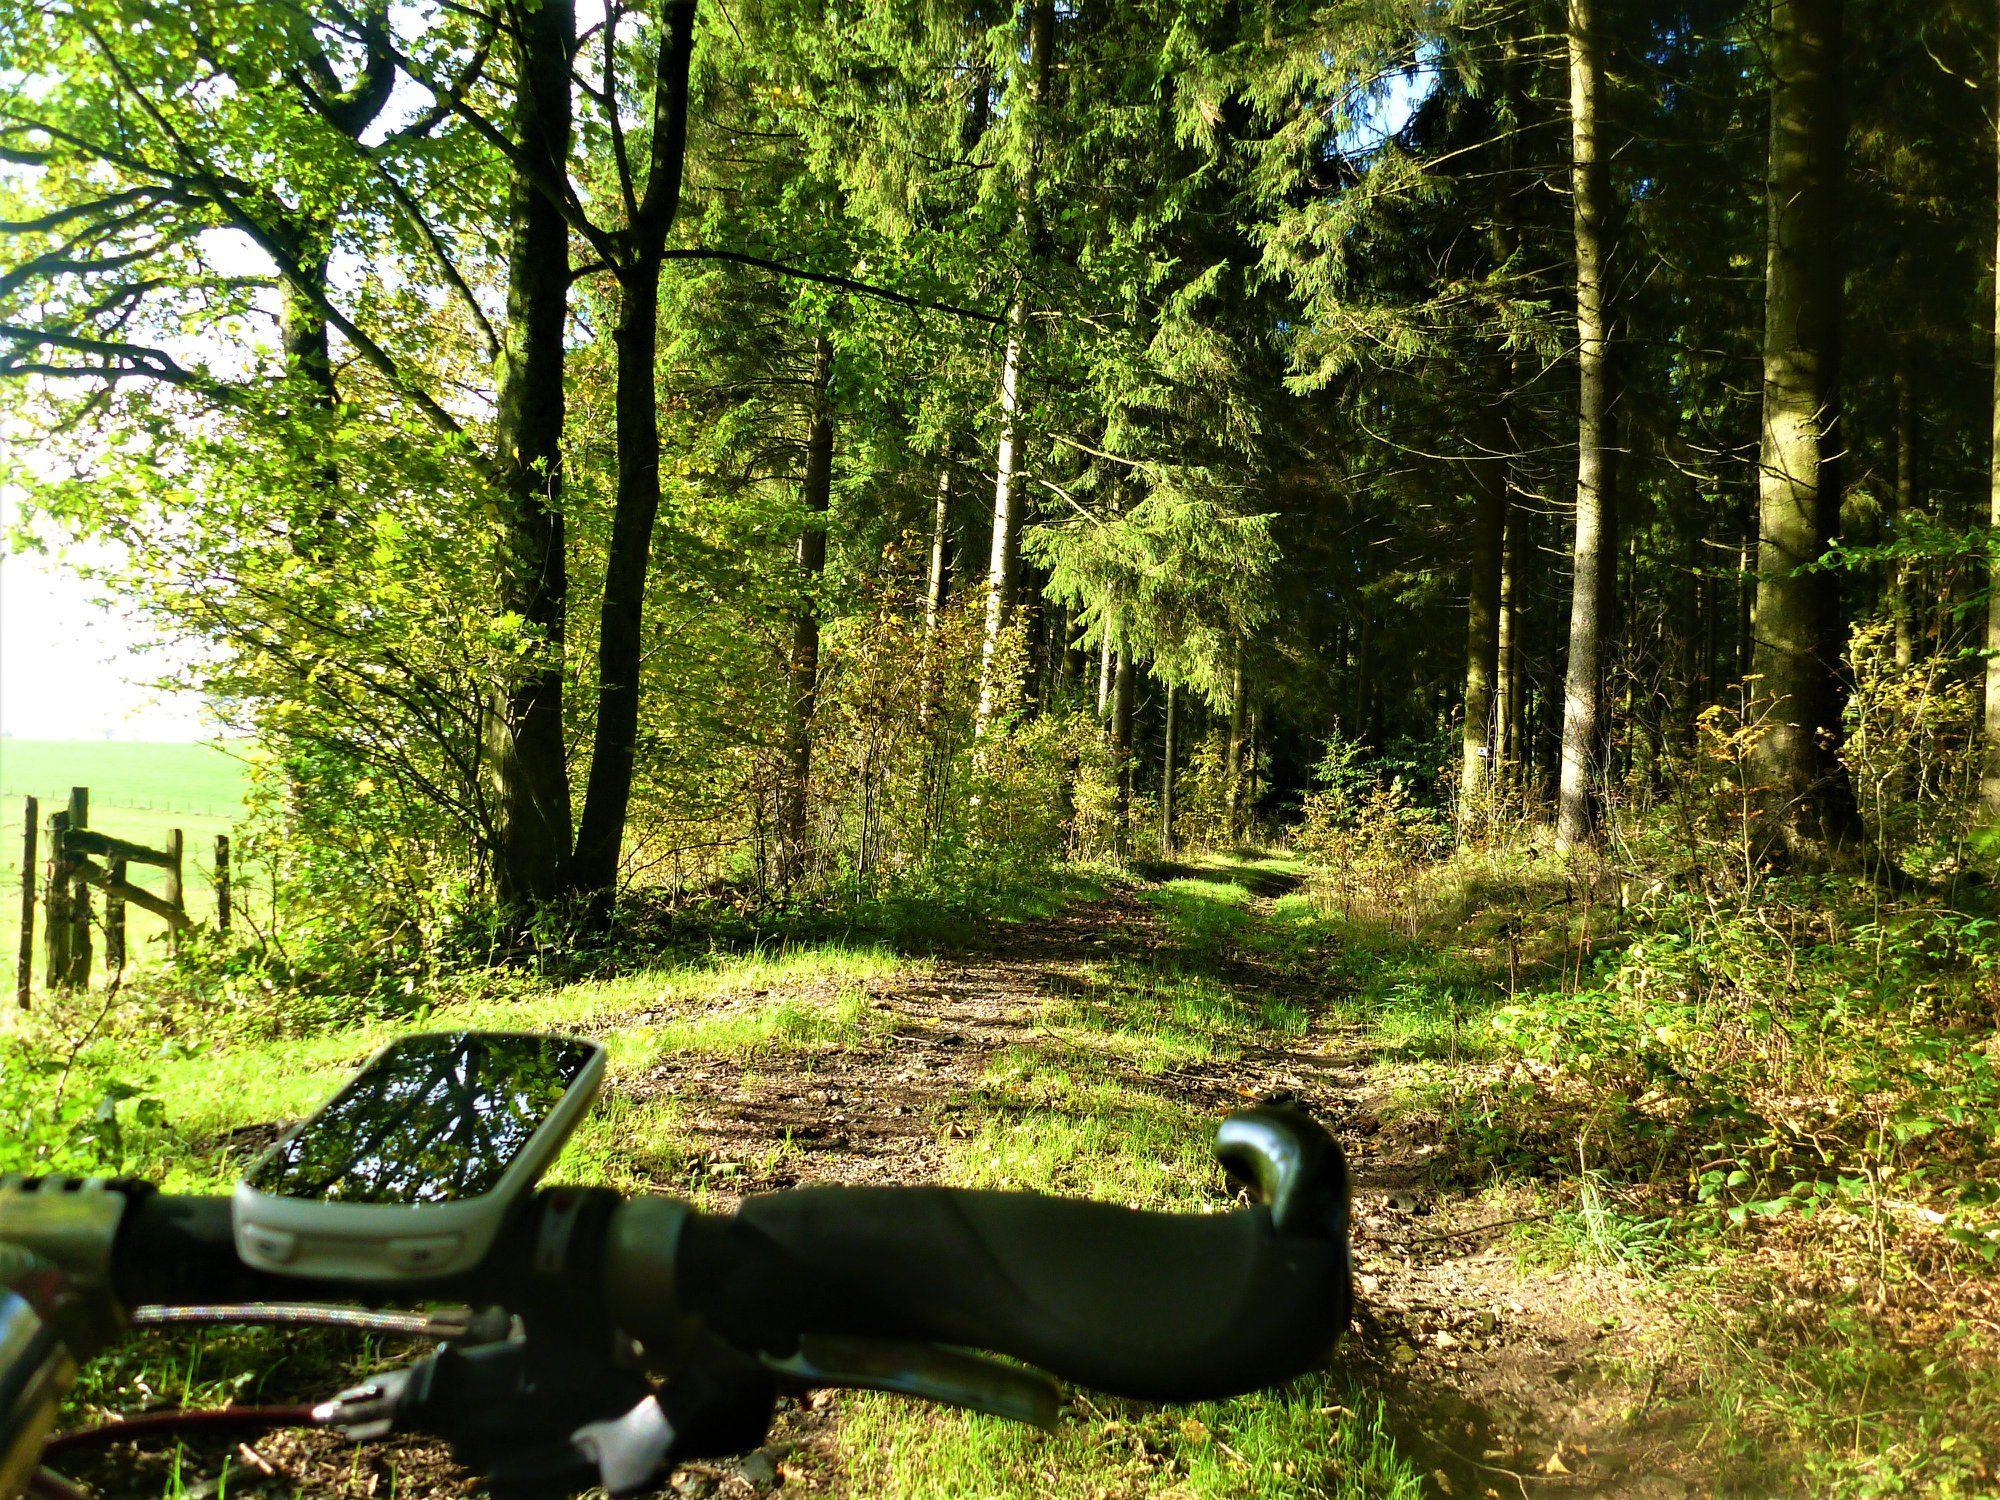 VTT dans la région de Faymonville / Parcours VTT 3 de Bütgenbach